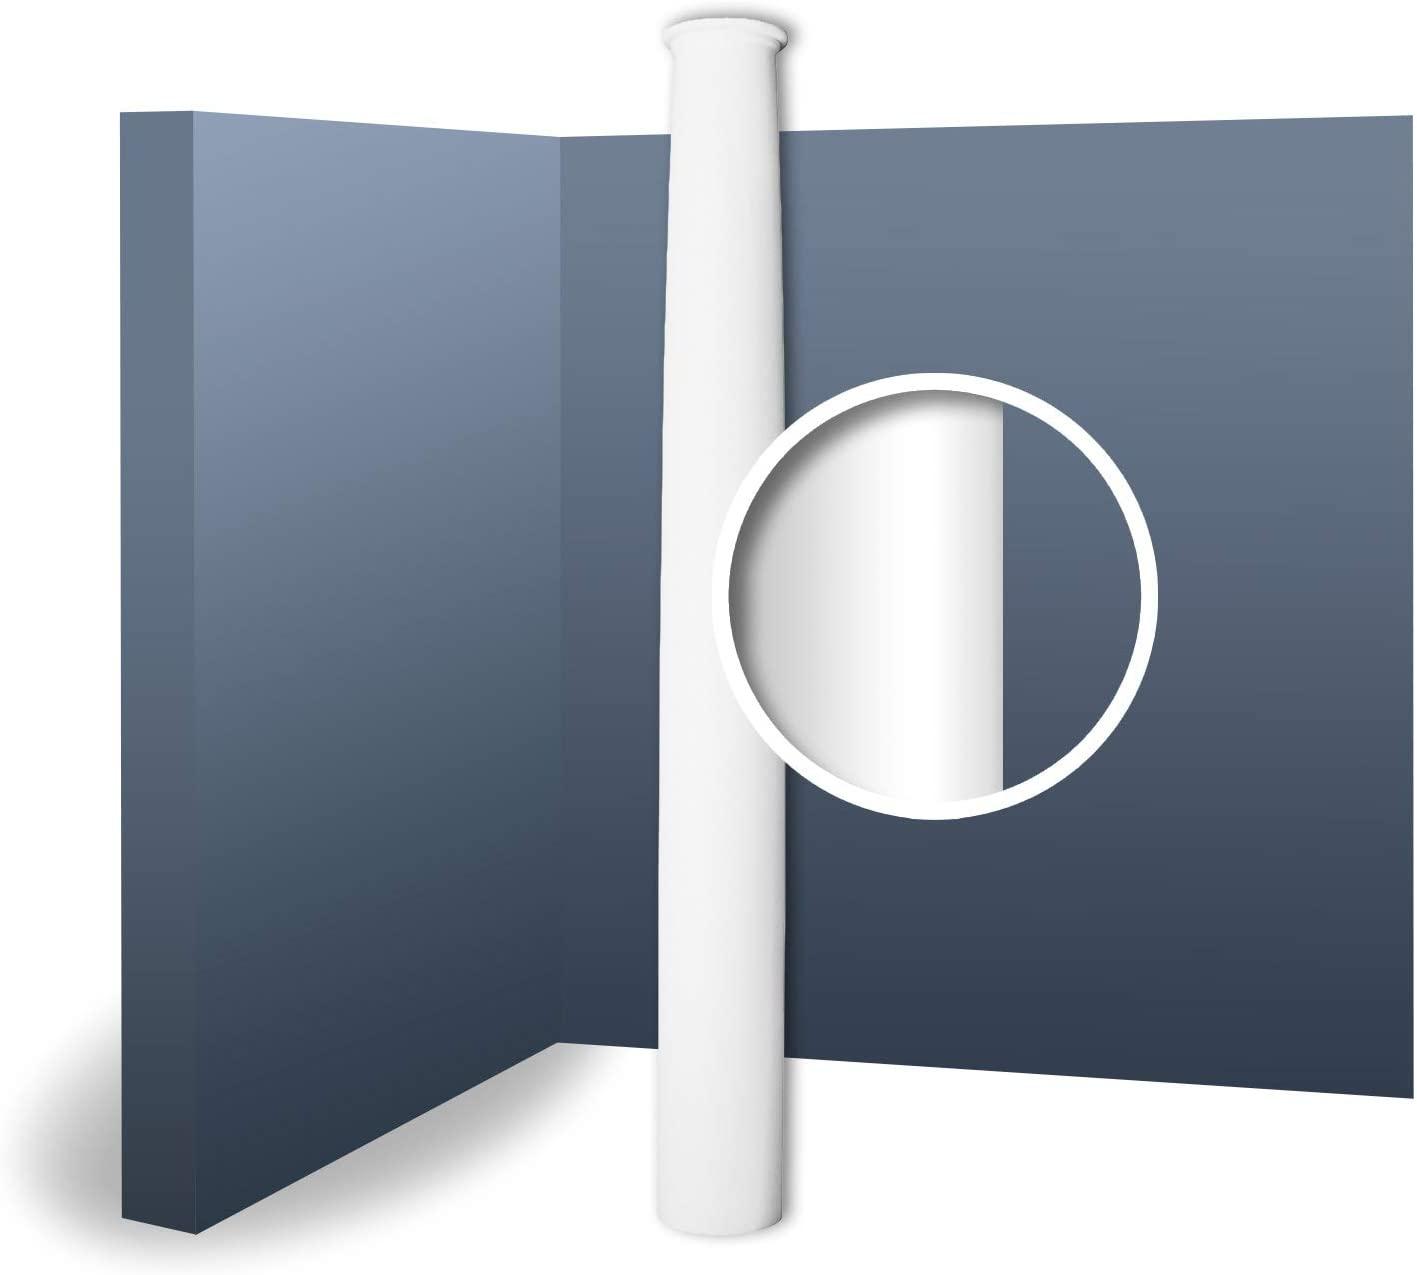 Full Column Shaft Stucco Decoration Orac Decor K1102 LUXXUS Lightweight and Impact Resistant 2.02 m